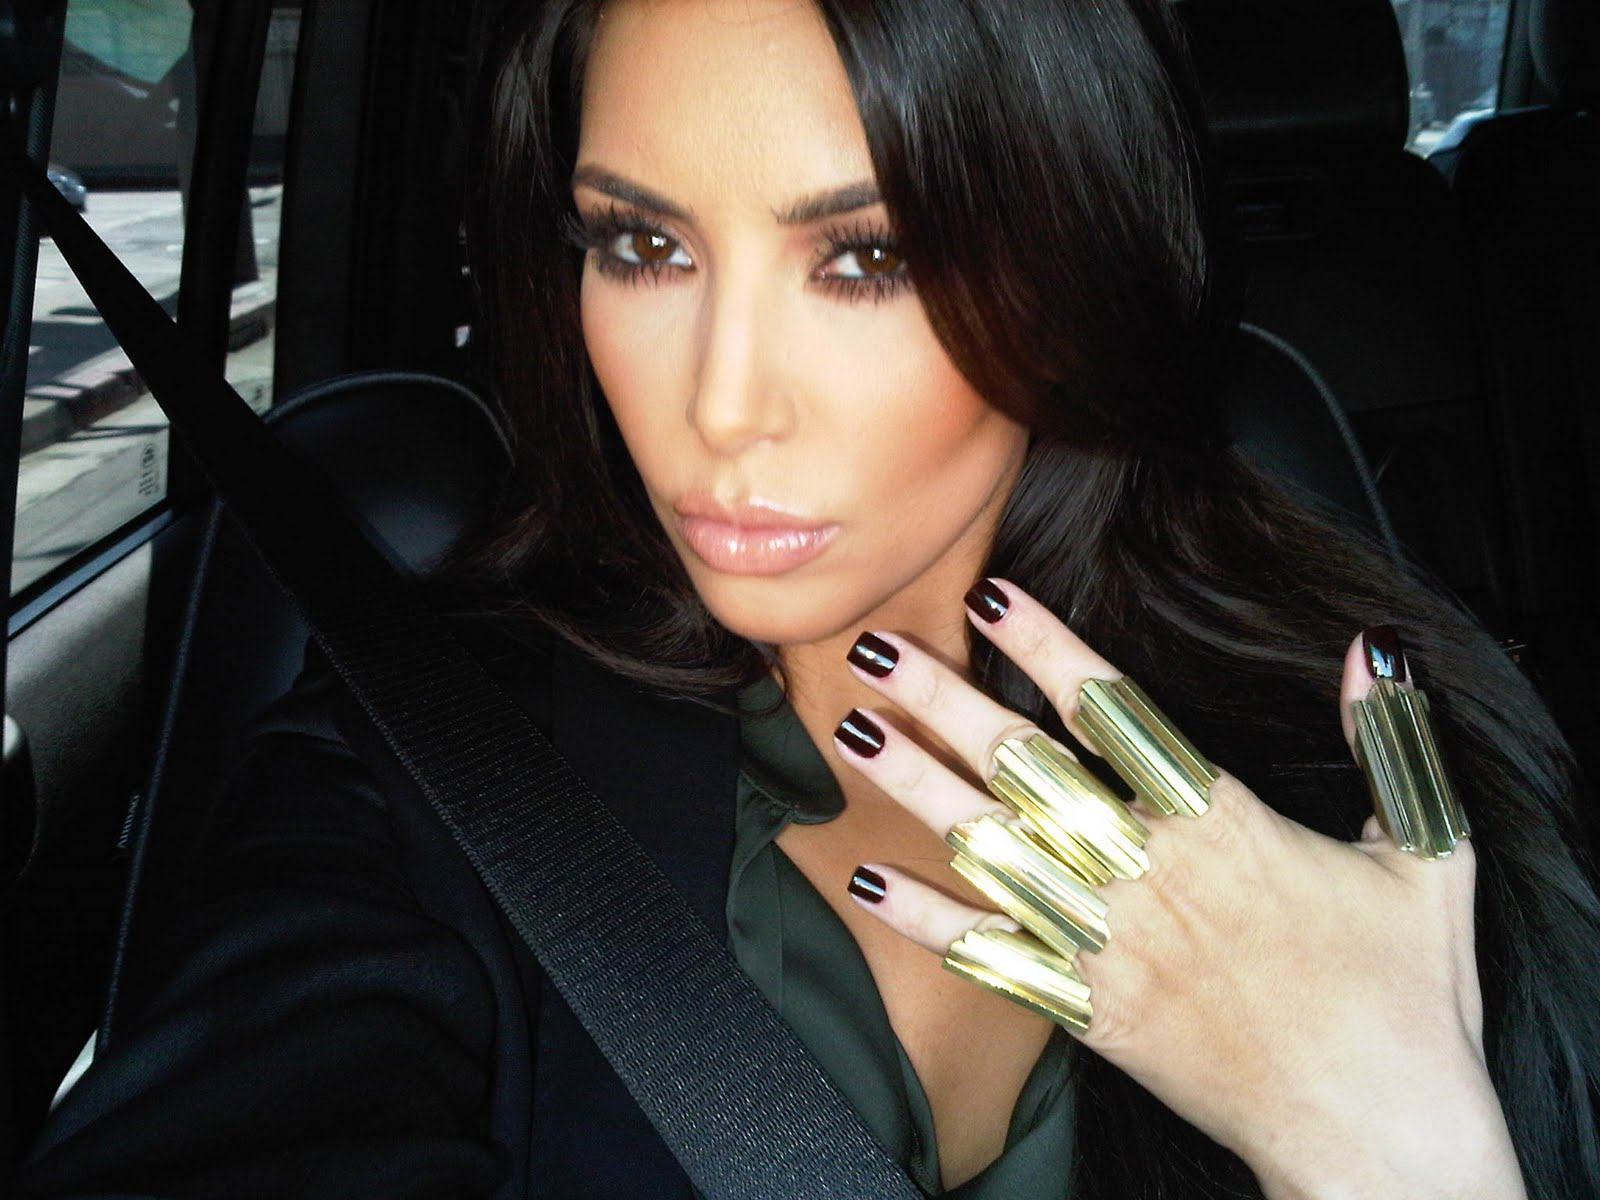 Kim Kardashian HQ Pics & Videos: Kim Kardashian Twitter Pics